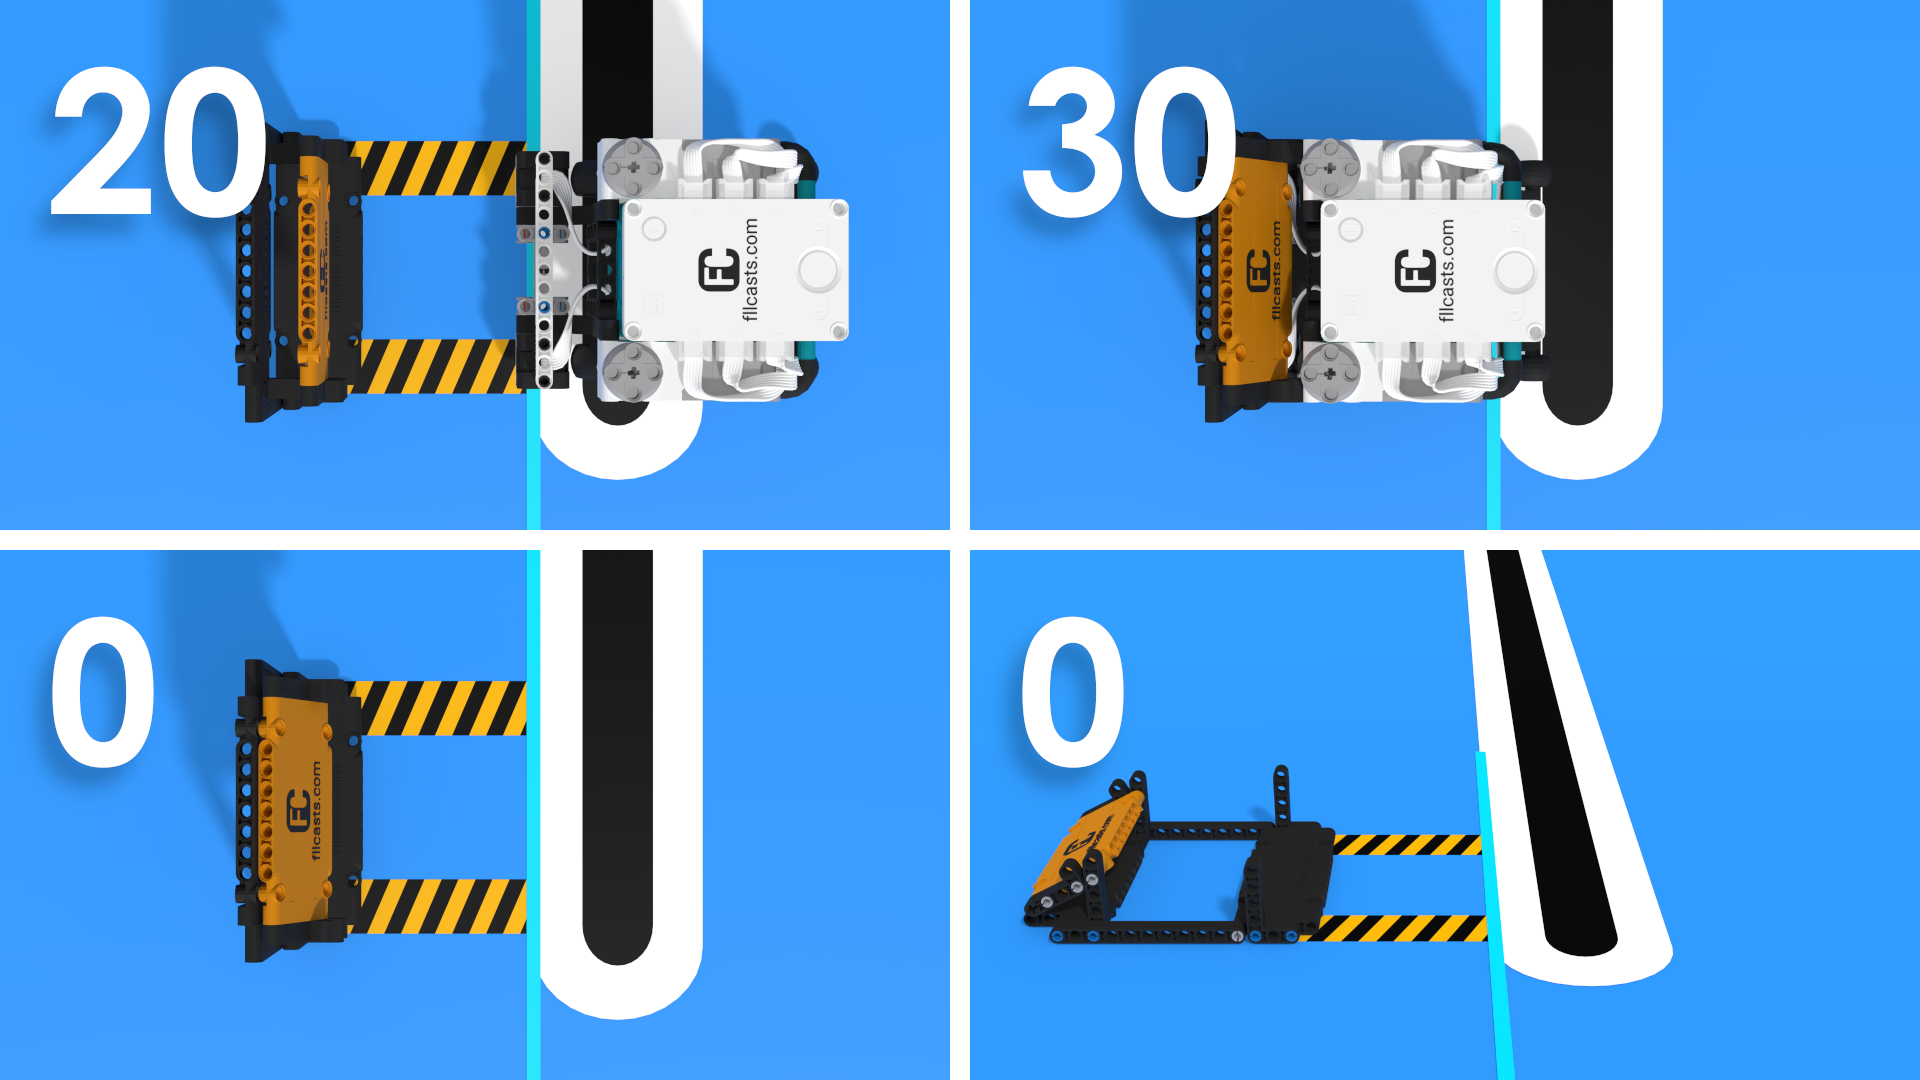 Accident Avoidance Score